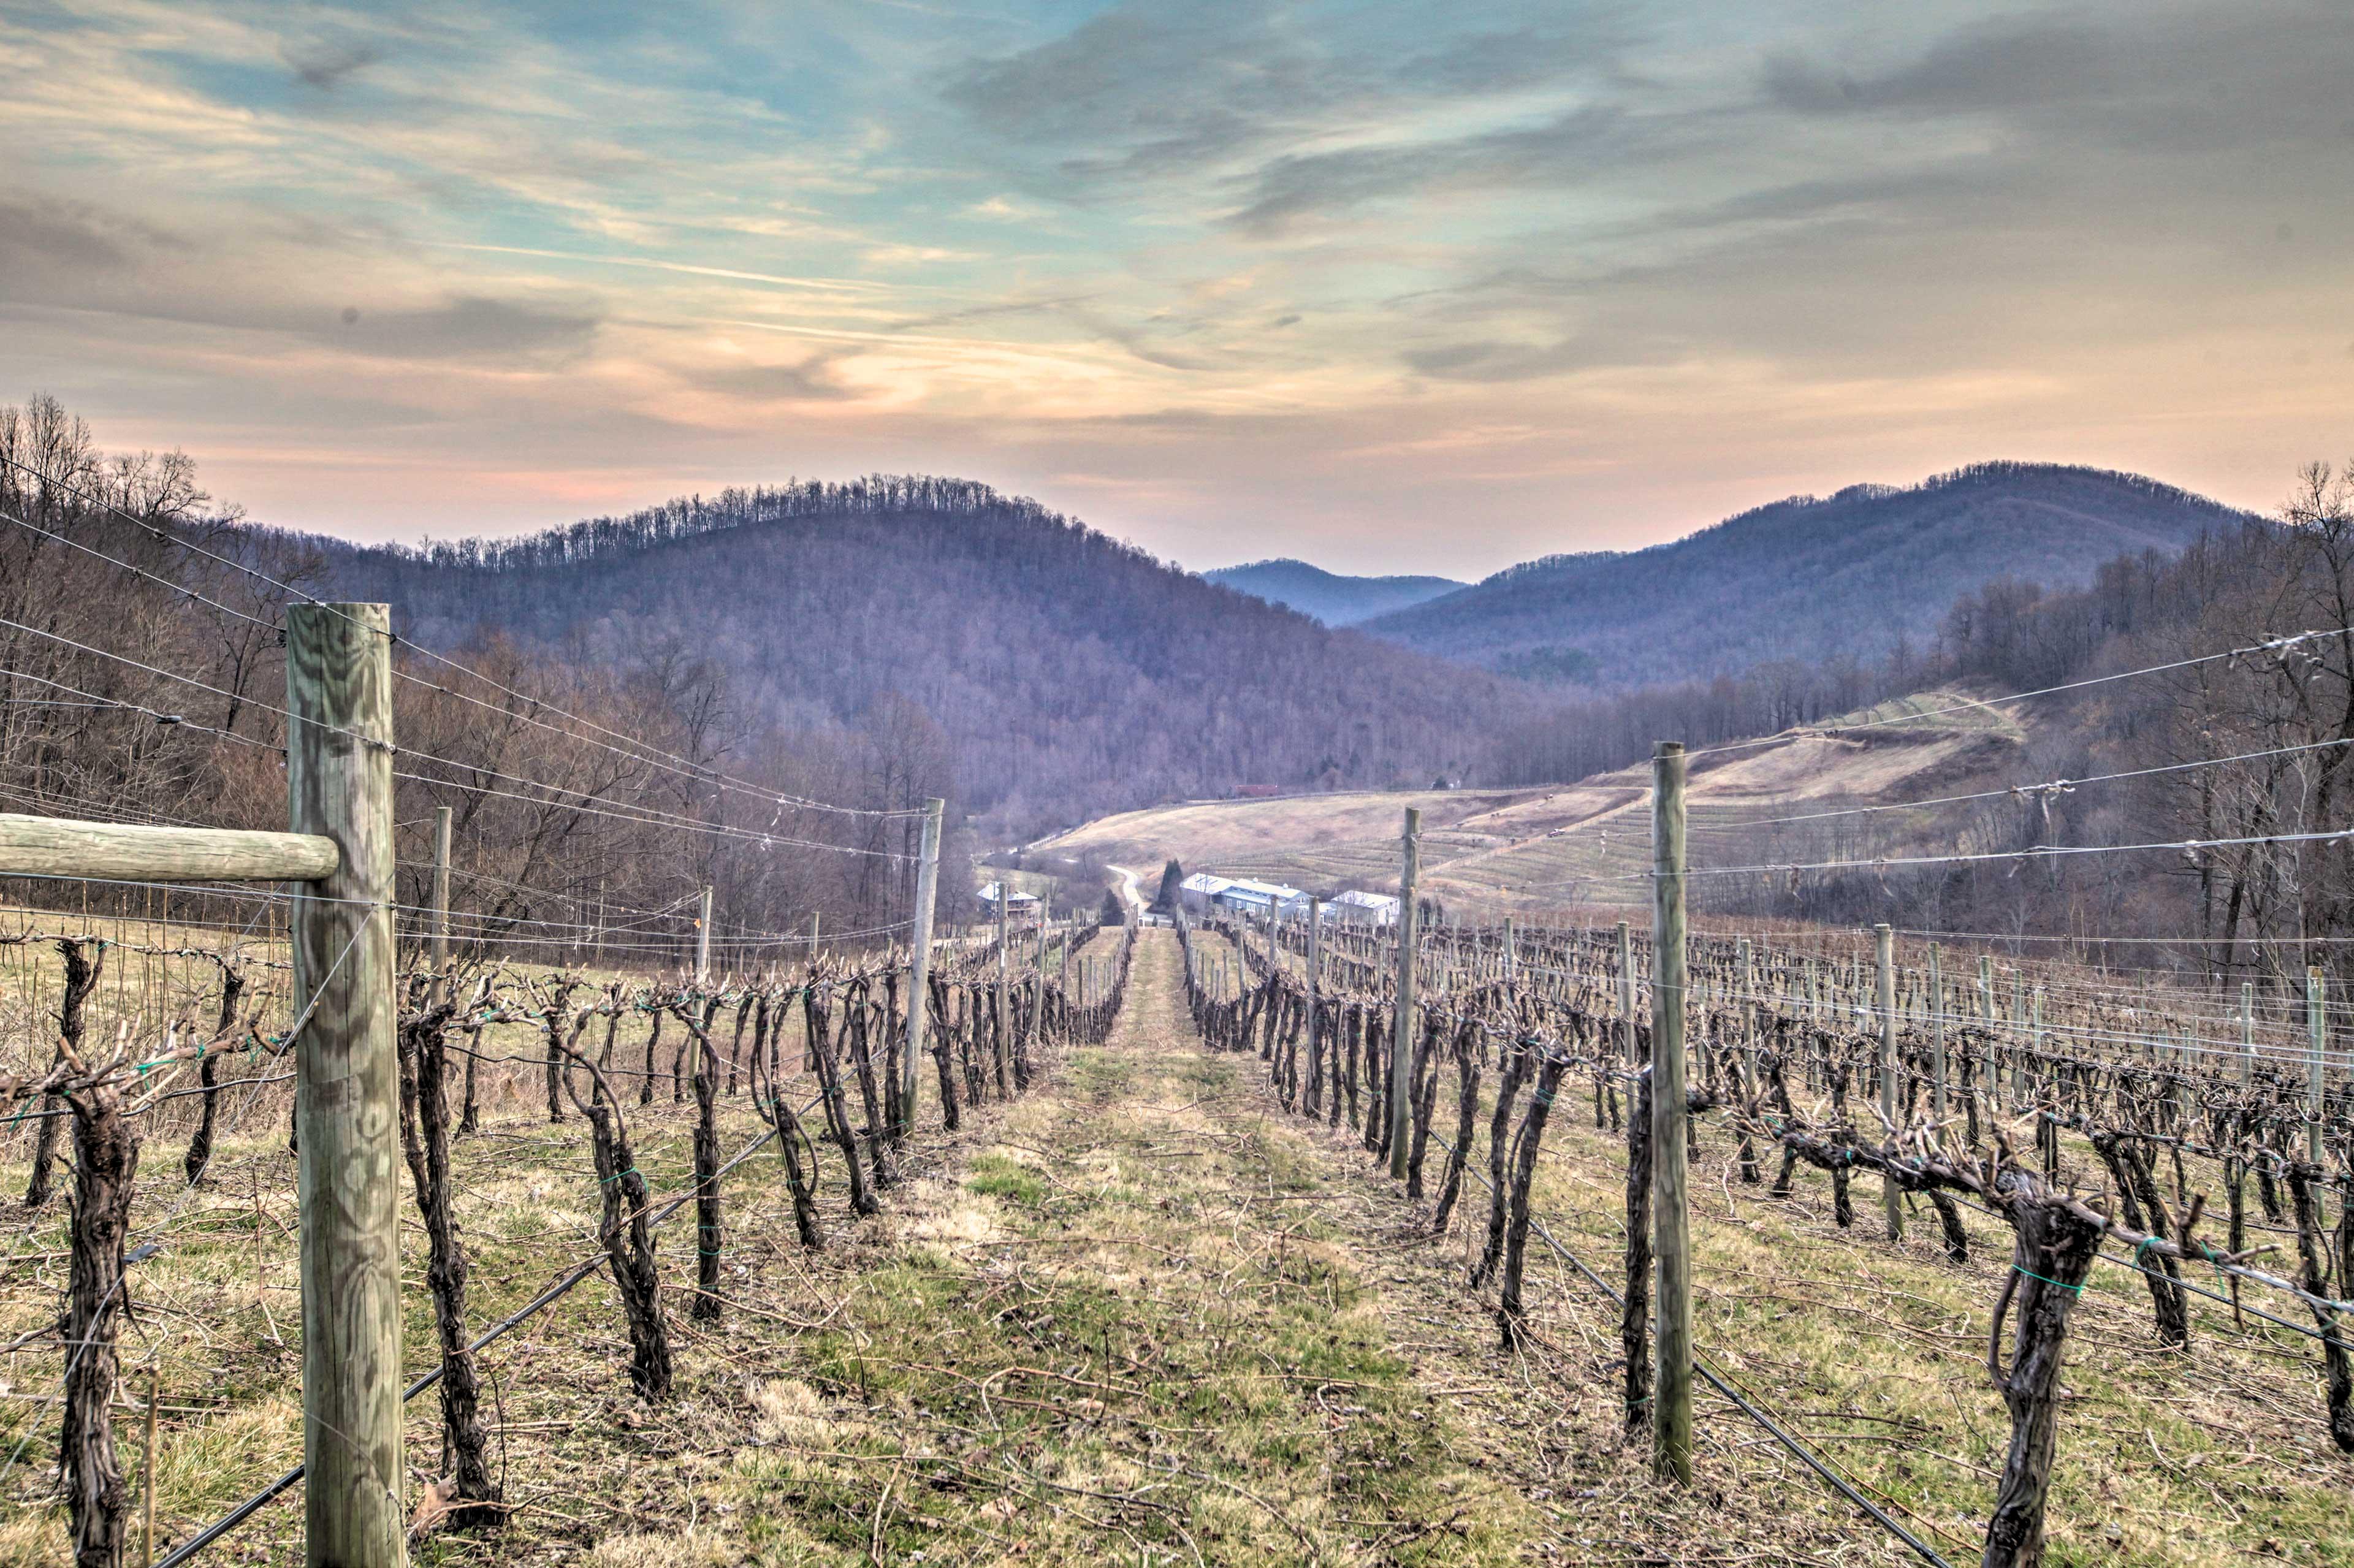 Faber Vacation Rental | 4BR | 4.5BA | Vineyard On-Site | 2,700 Sq Ft